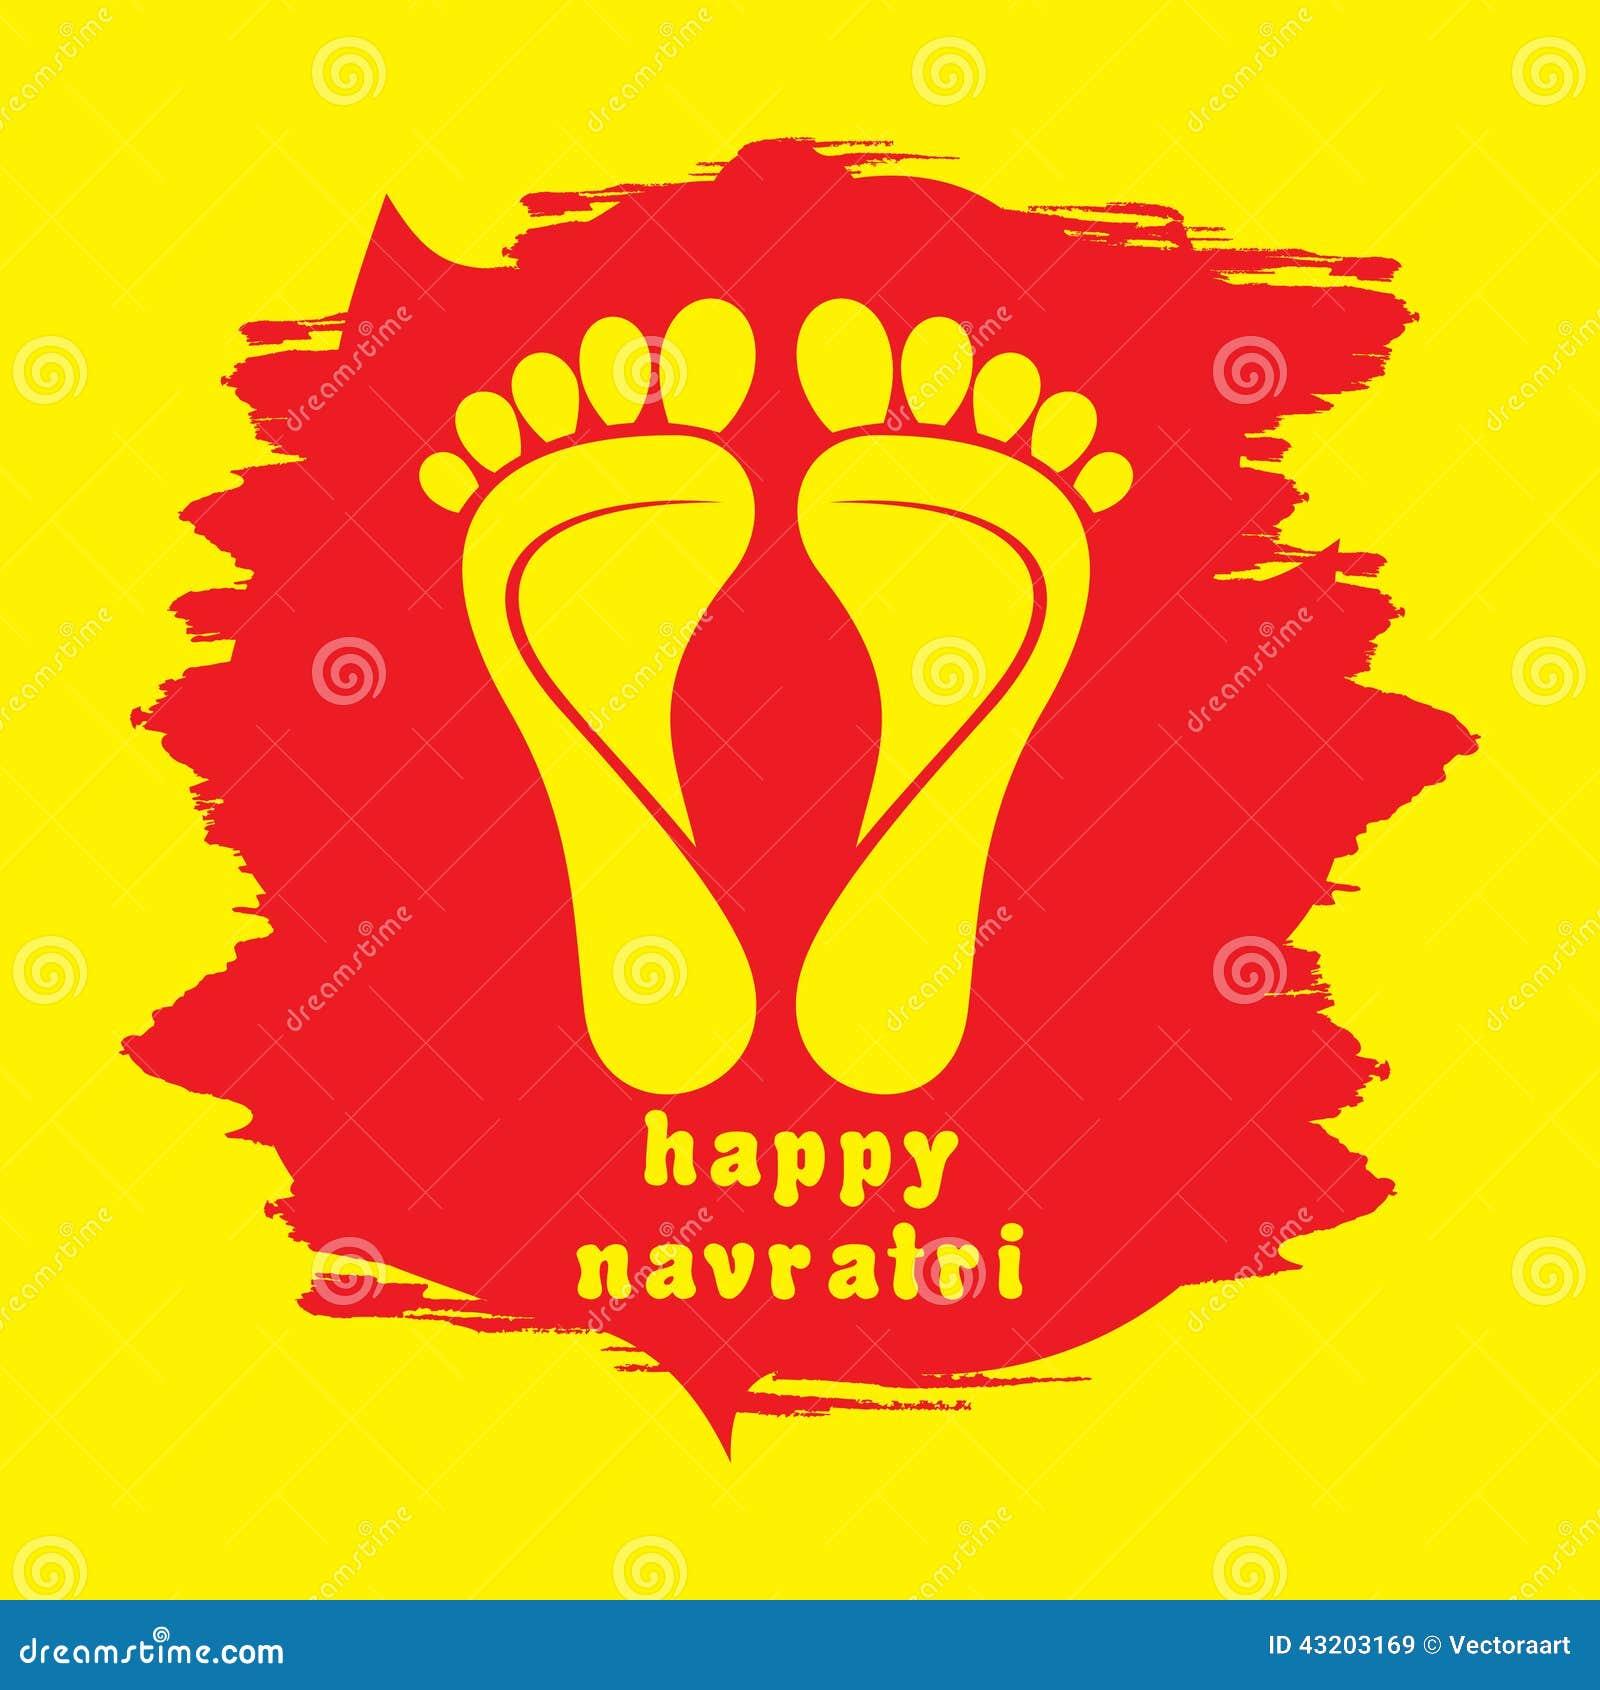 Happy diwali or navratri festival greeting card stock vector happy diwali or navratri festival greeting card kristyandbryce Choice Image